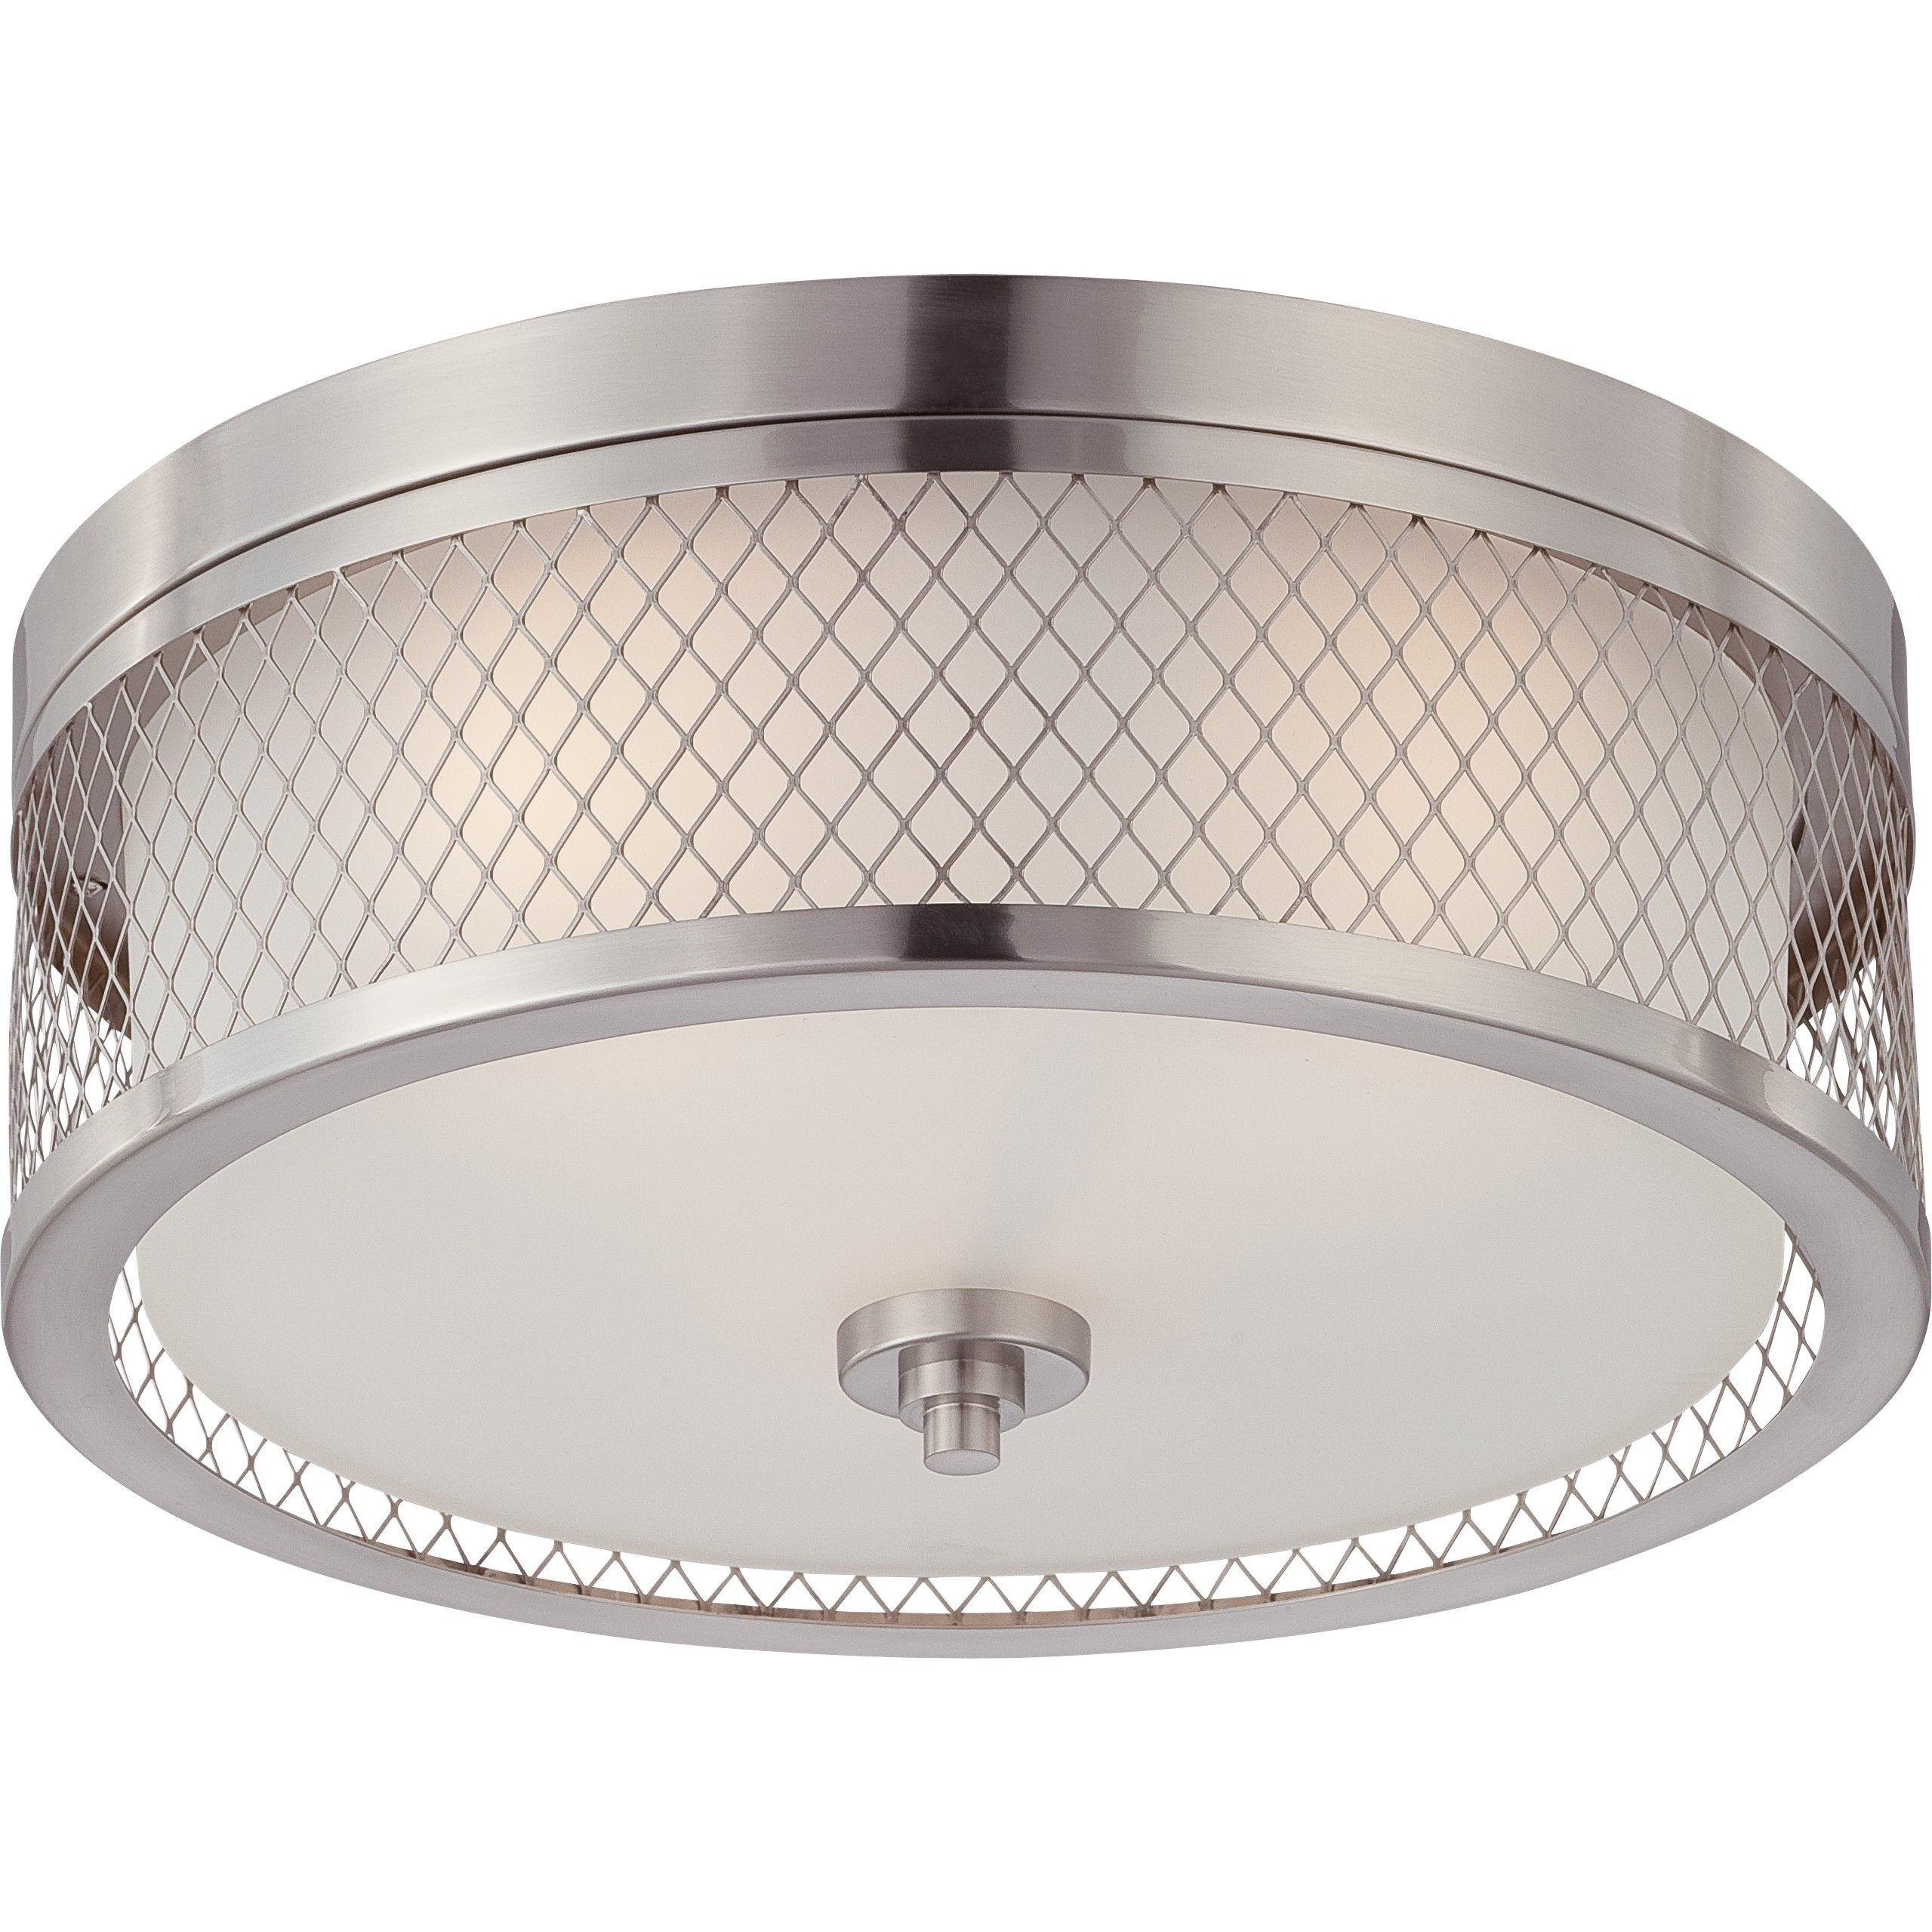 Nuvo 60 4691 3 light dome flush mount light fixture fusion nuvo 60 4691 3 light dome flush mount light fixture fusion collection arubaitofo Choice Image